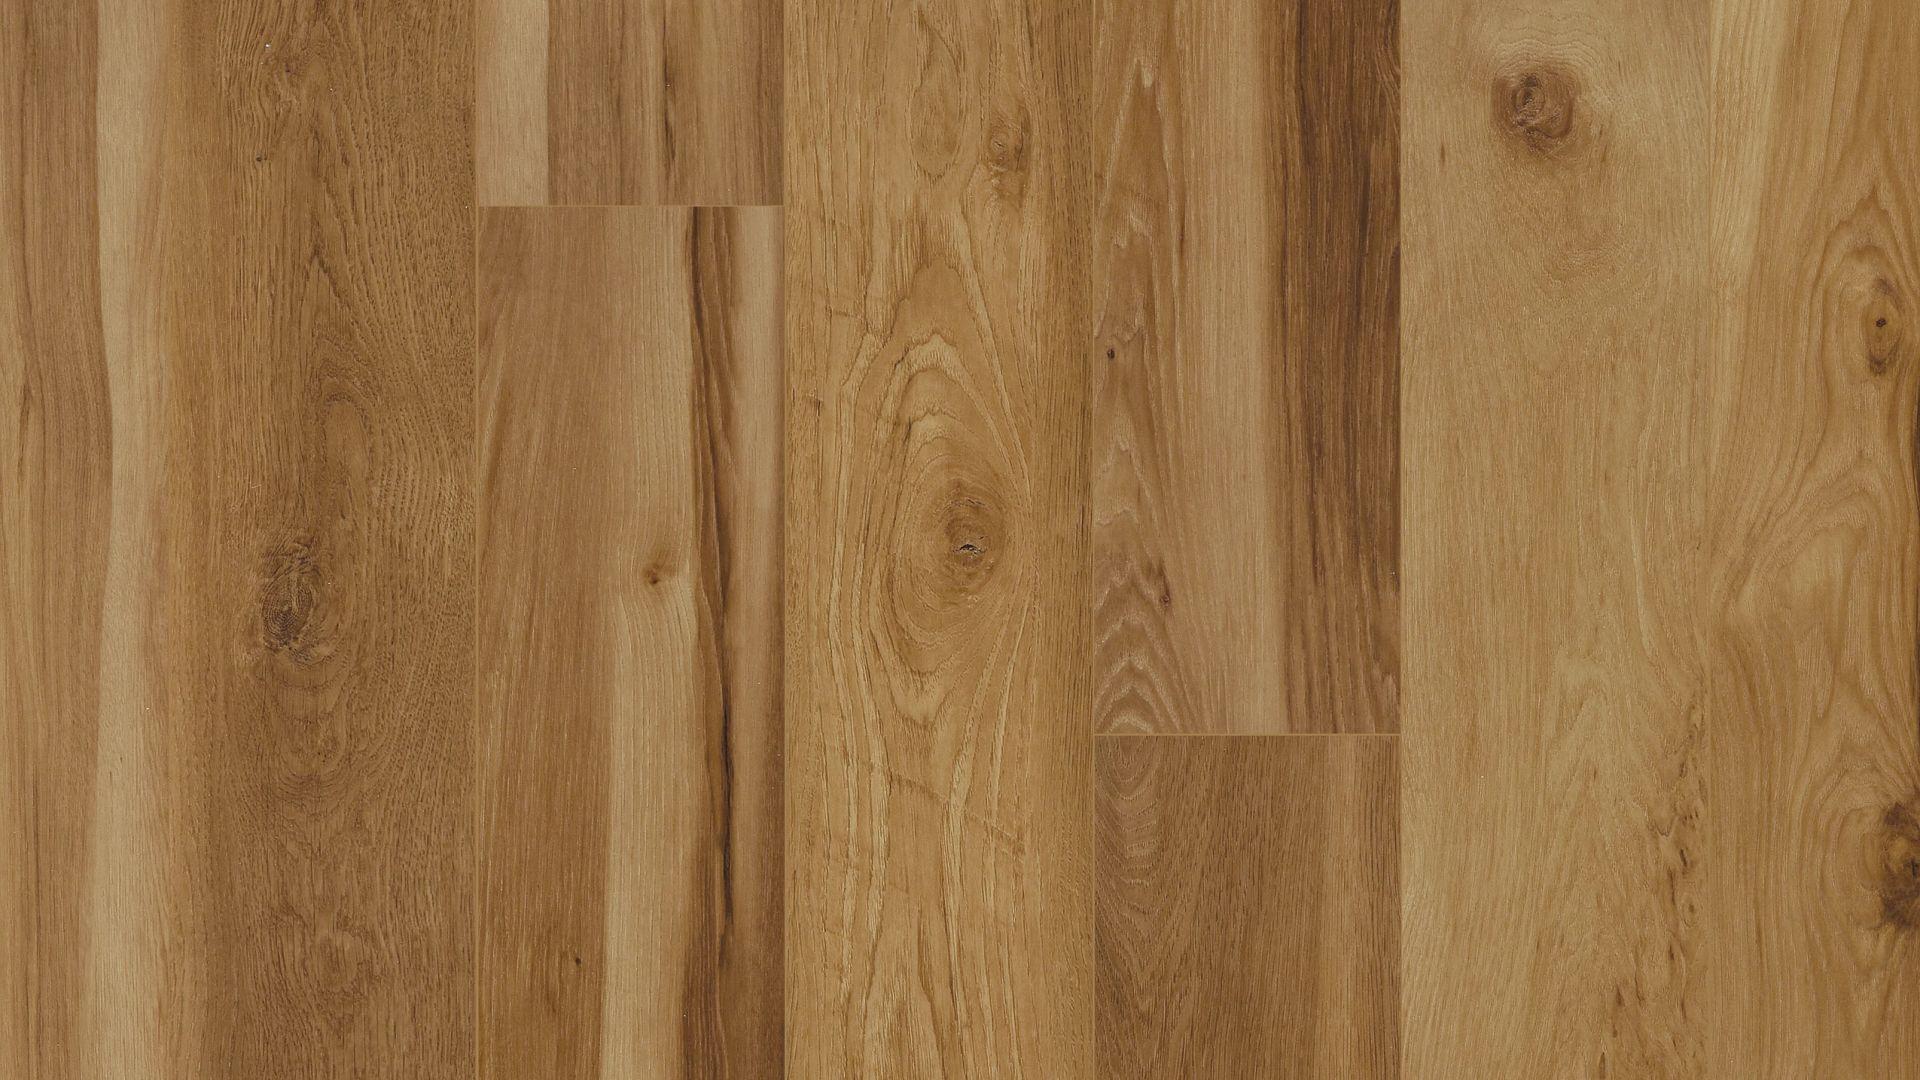 Blended Caraway EVP Vinyl Flooring Product Shot